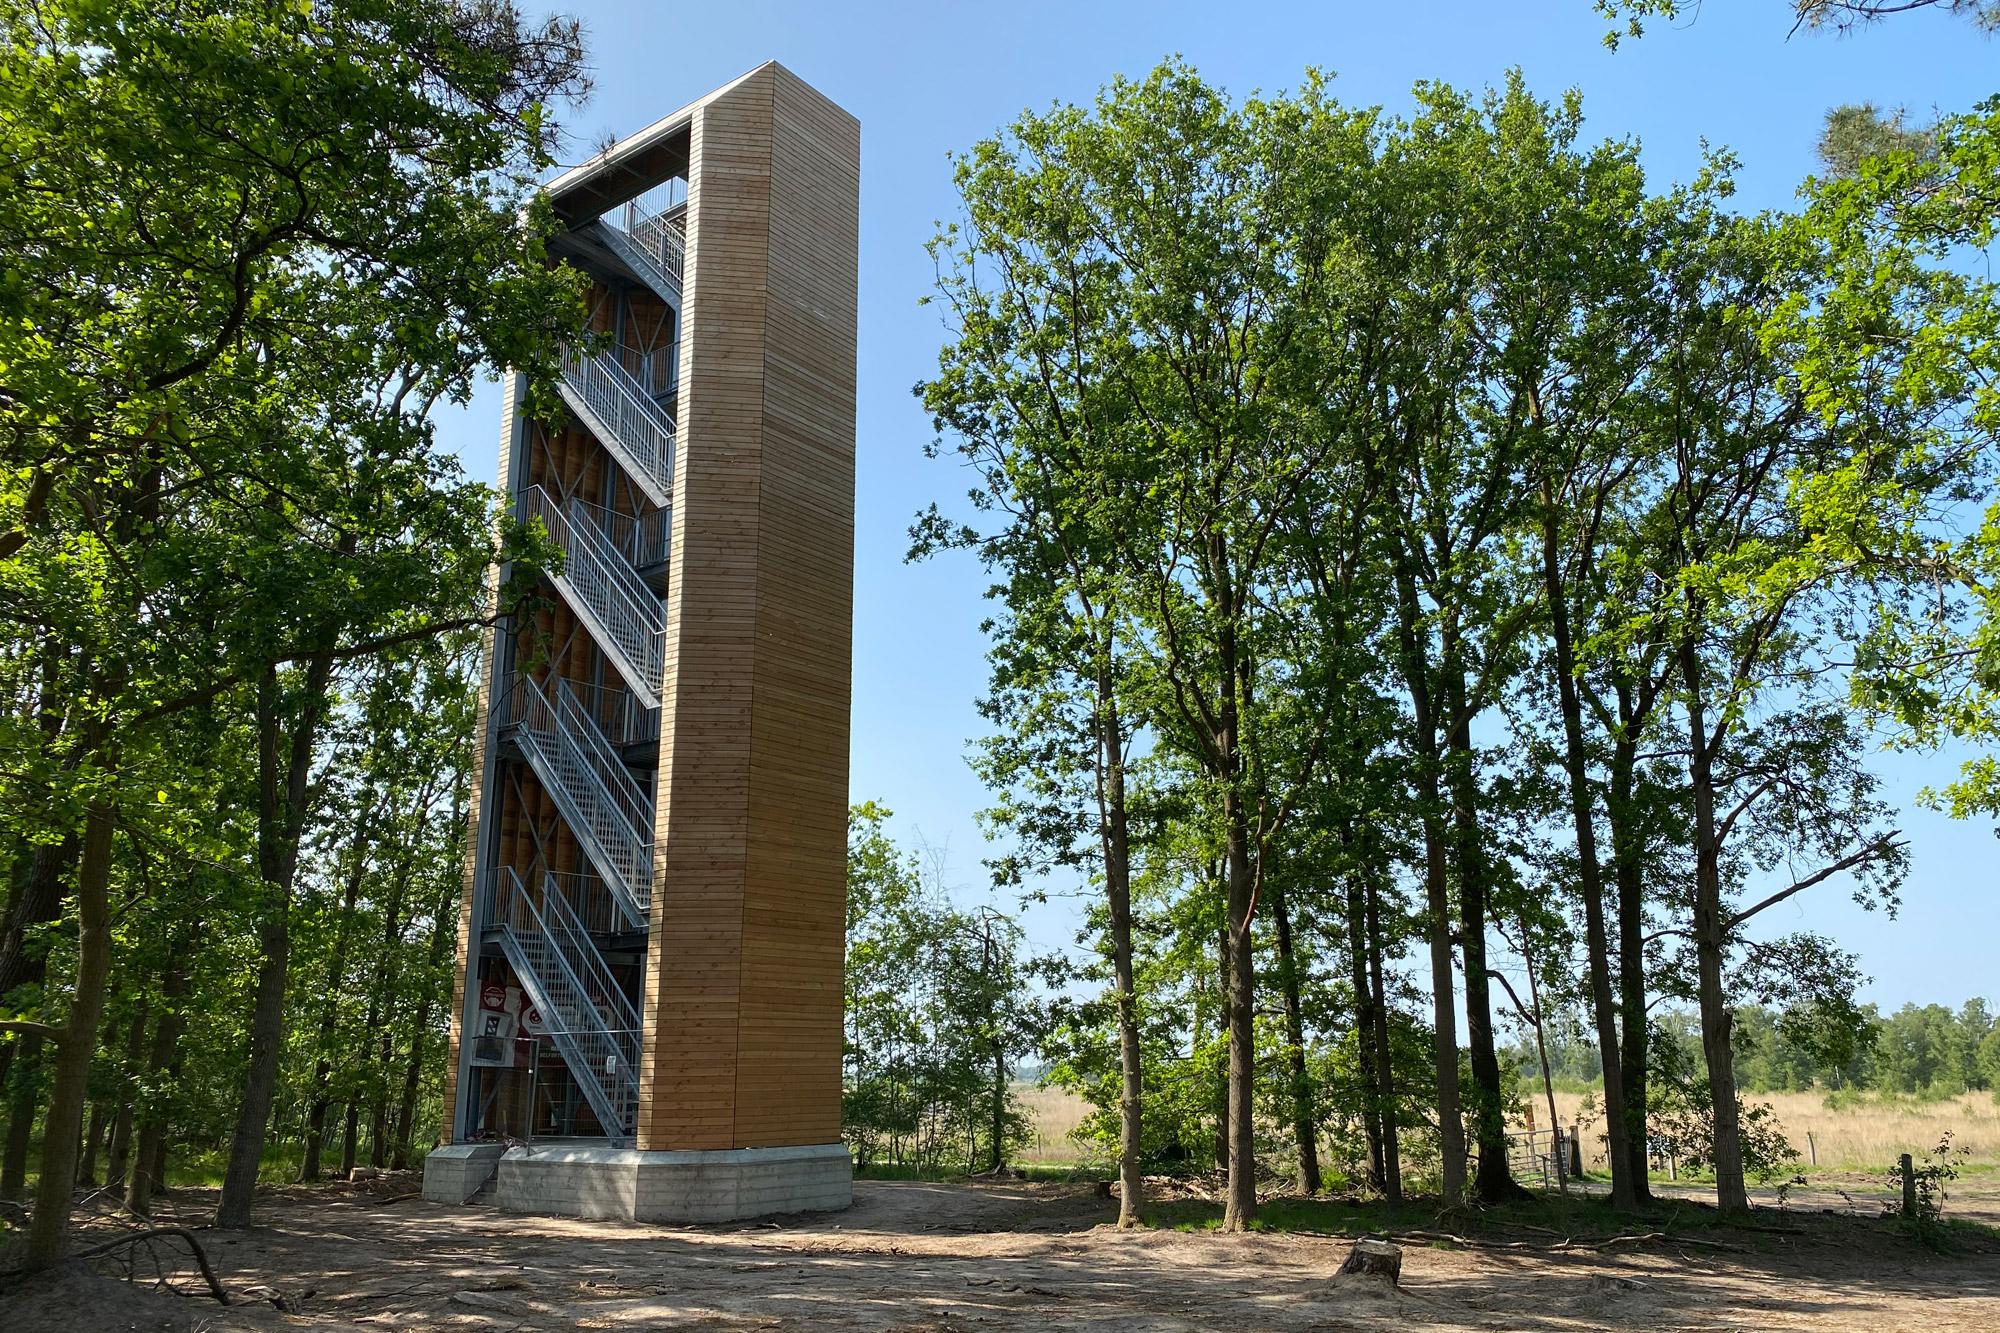 Wandelen: Vossenberg route